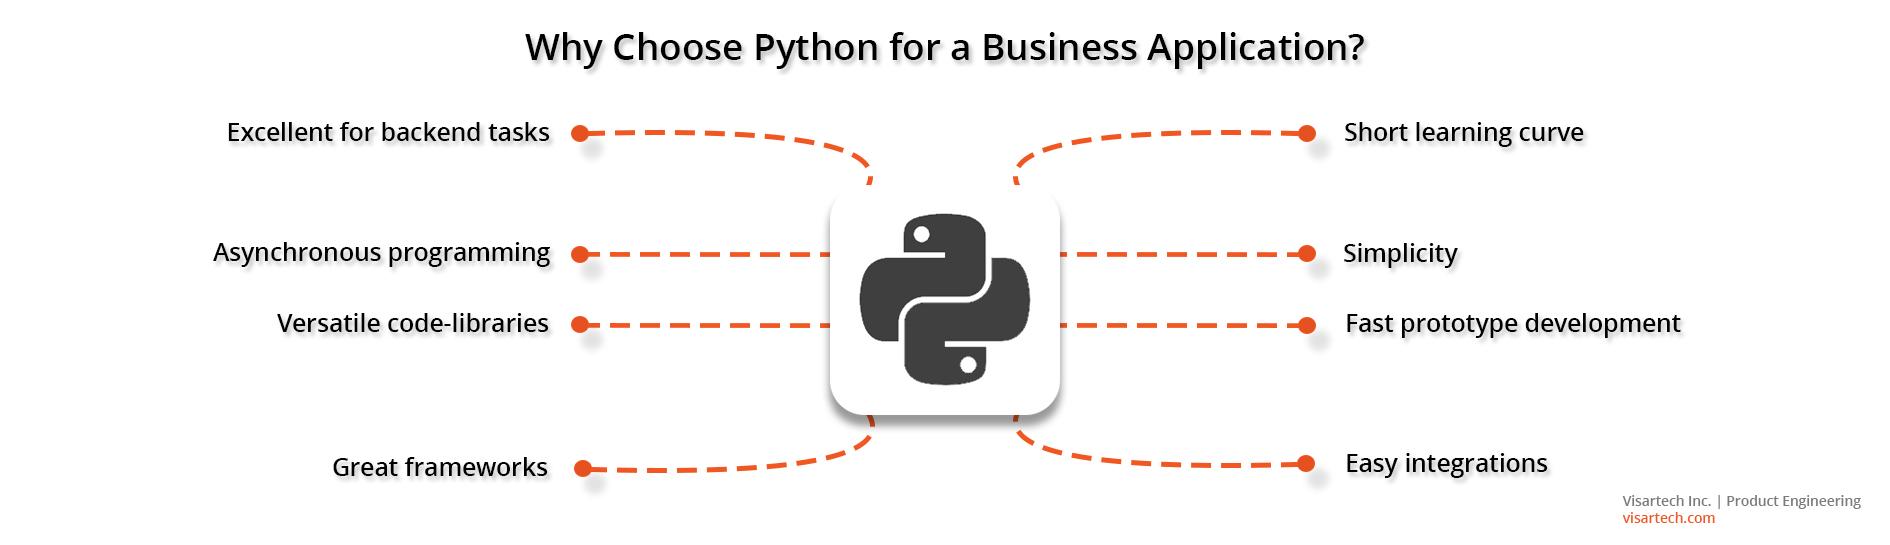 Benefits of Python in apps - Visartech Blog